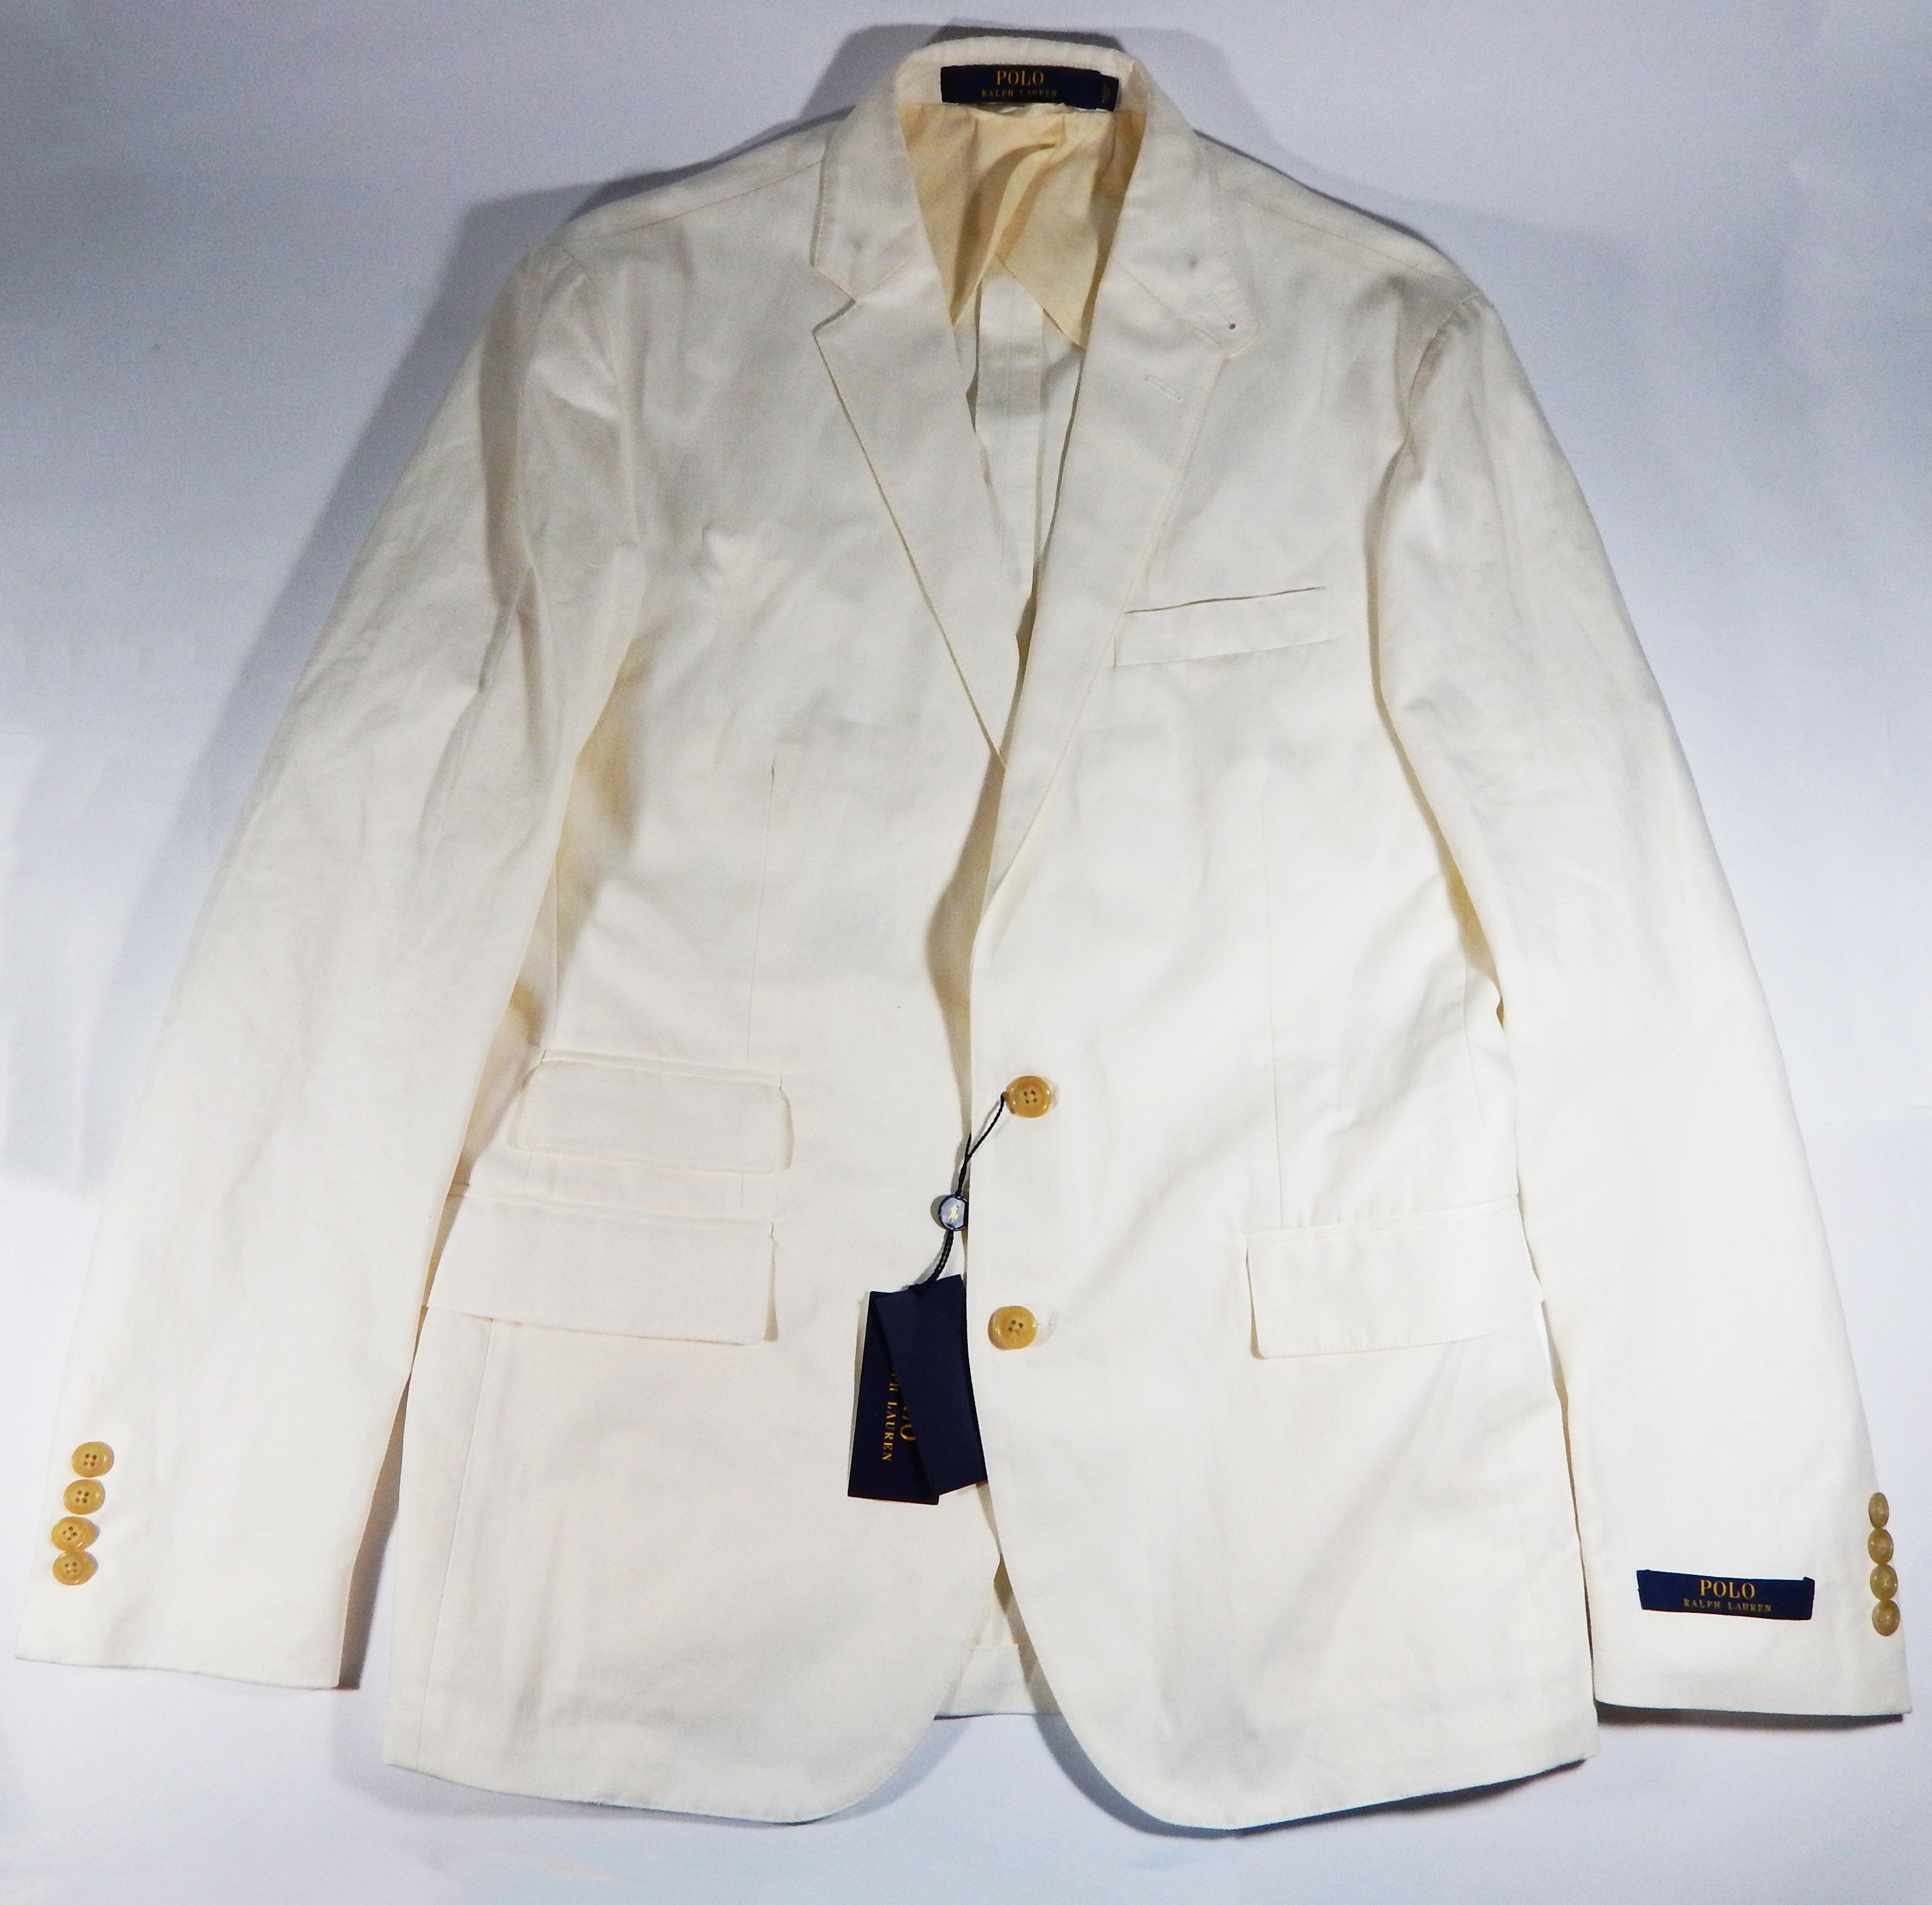 ab583297a3 NEW Polo Ralph Lauren Cotton-Linen Morgan Slim Fit Sport Coat